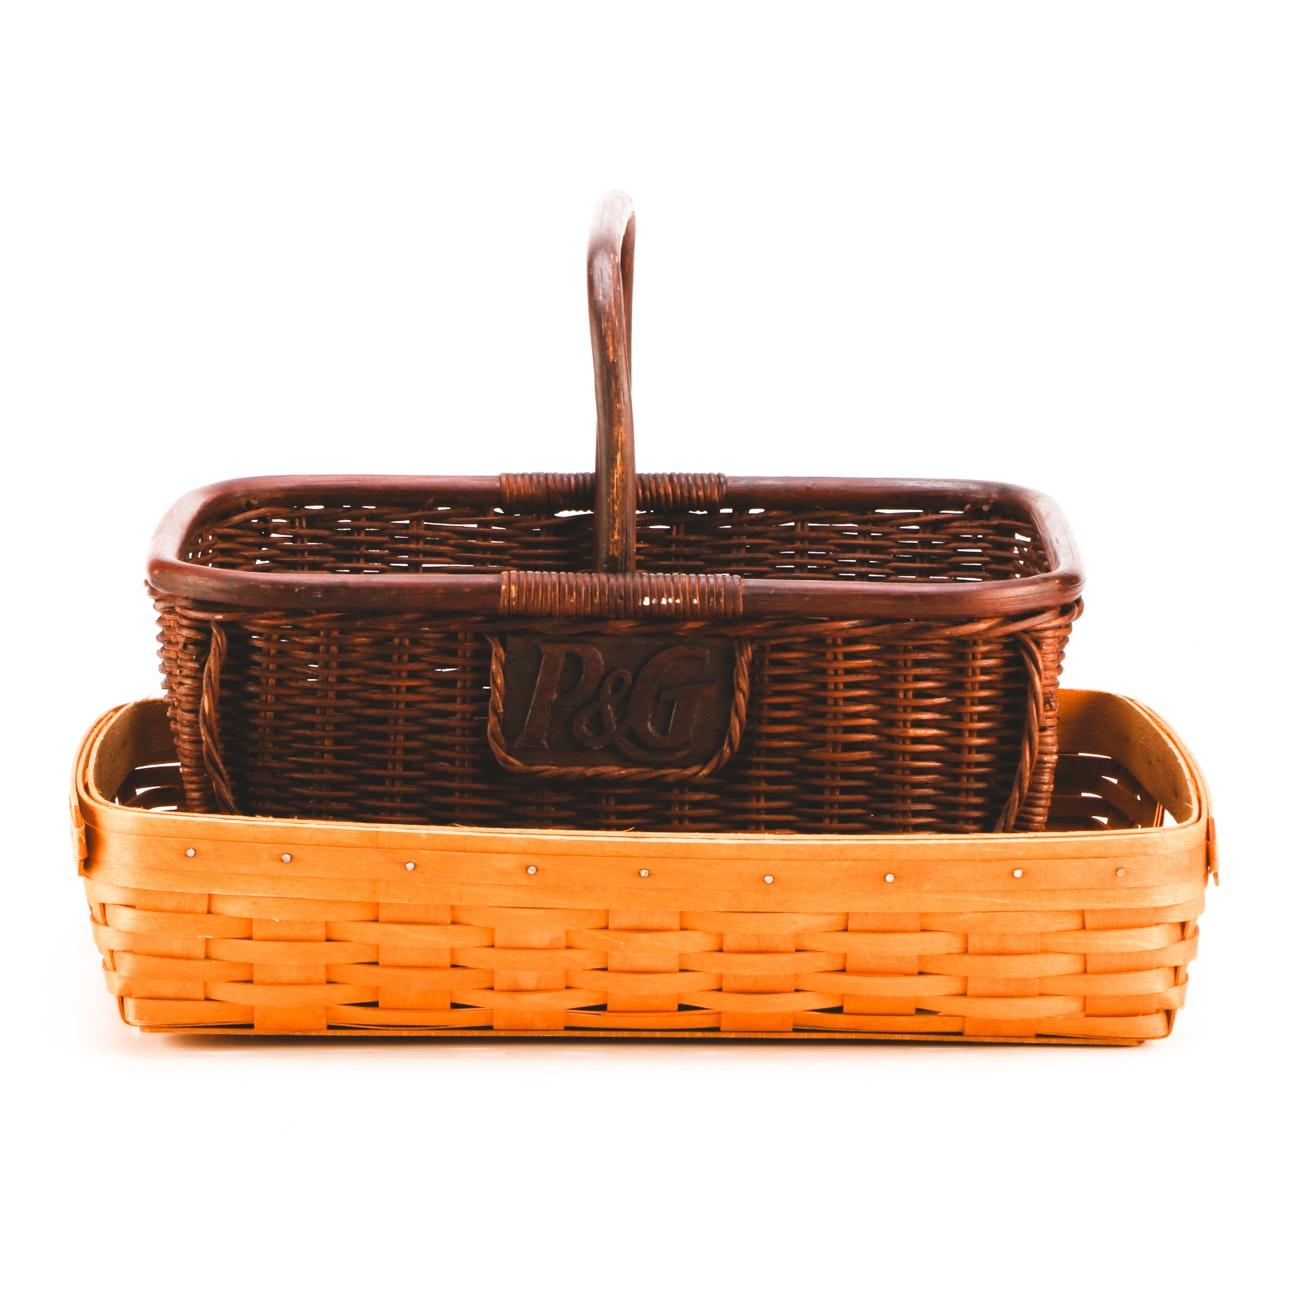 Pair of Decorative Baskets Featuring Longaberger